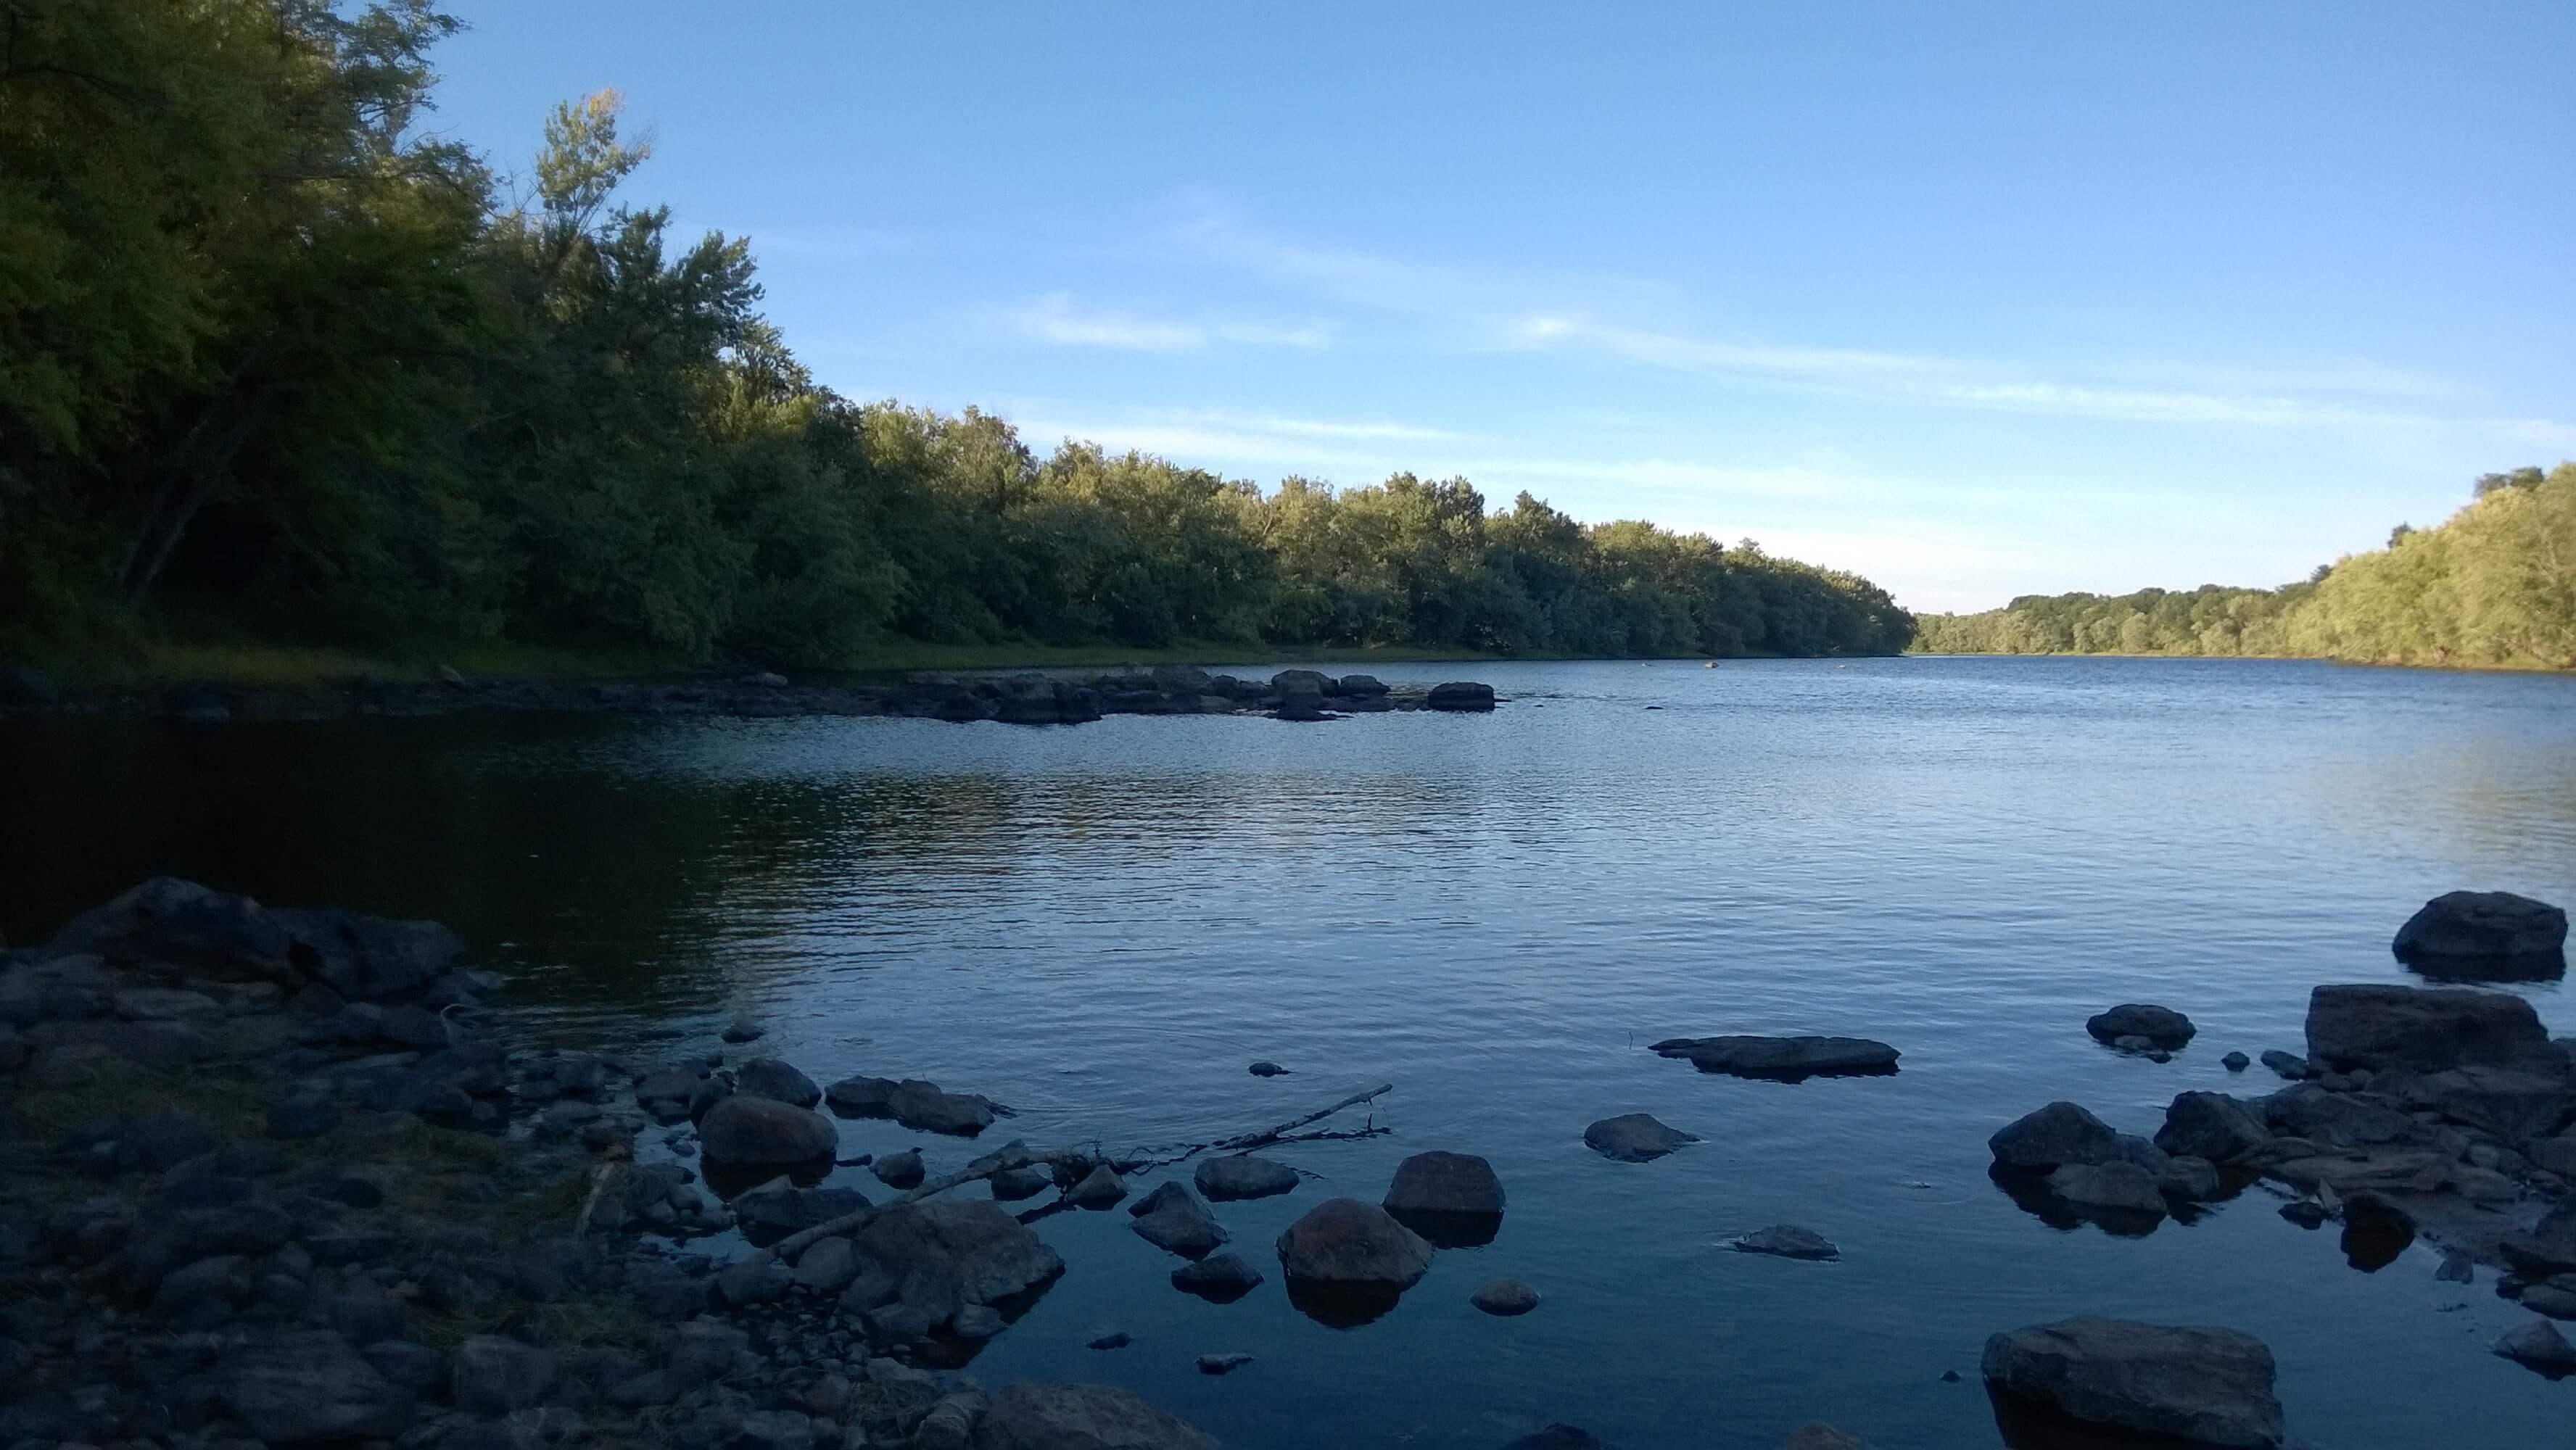 Merrimack river, Wikimedia Commons